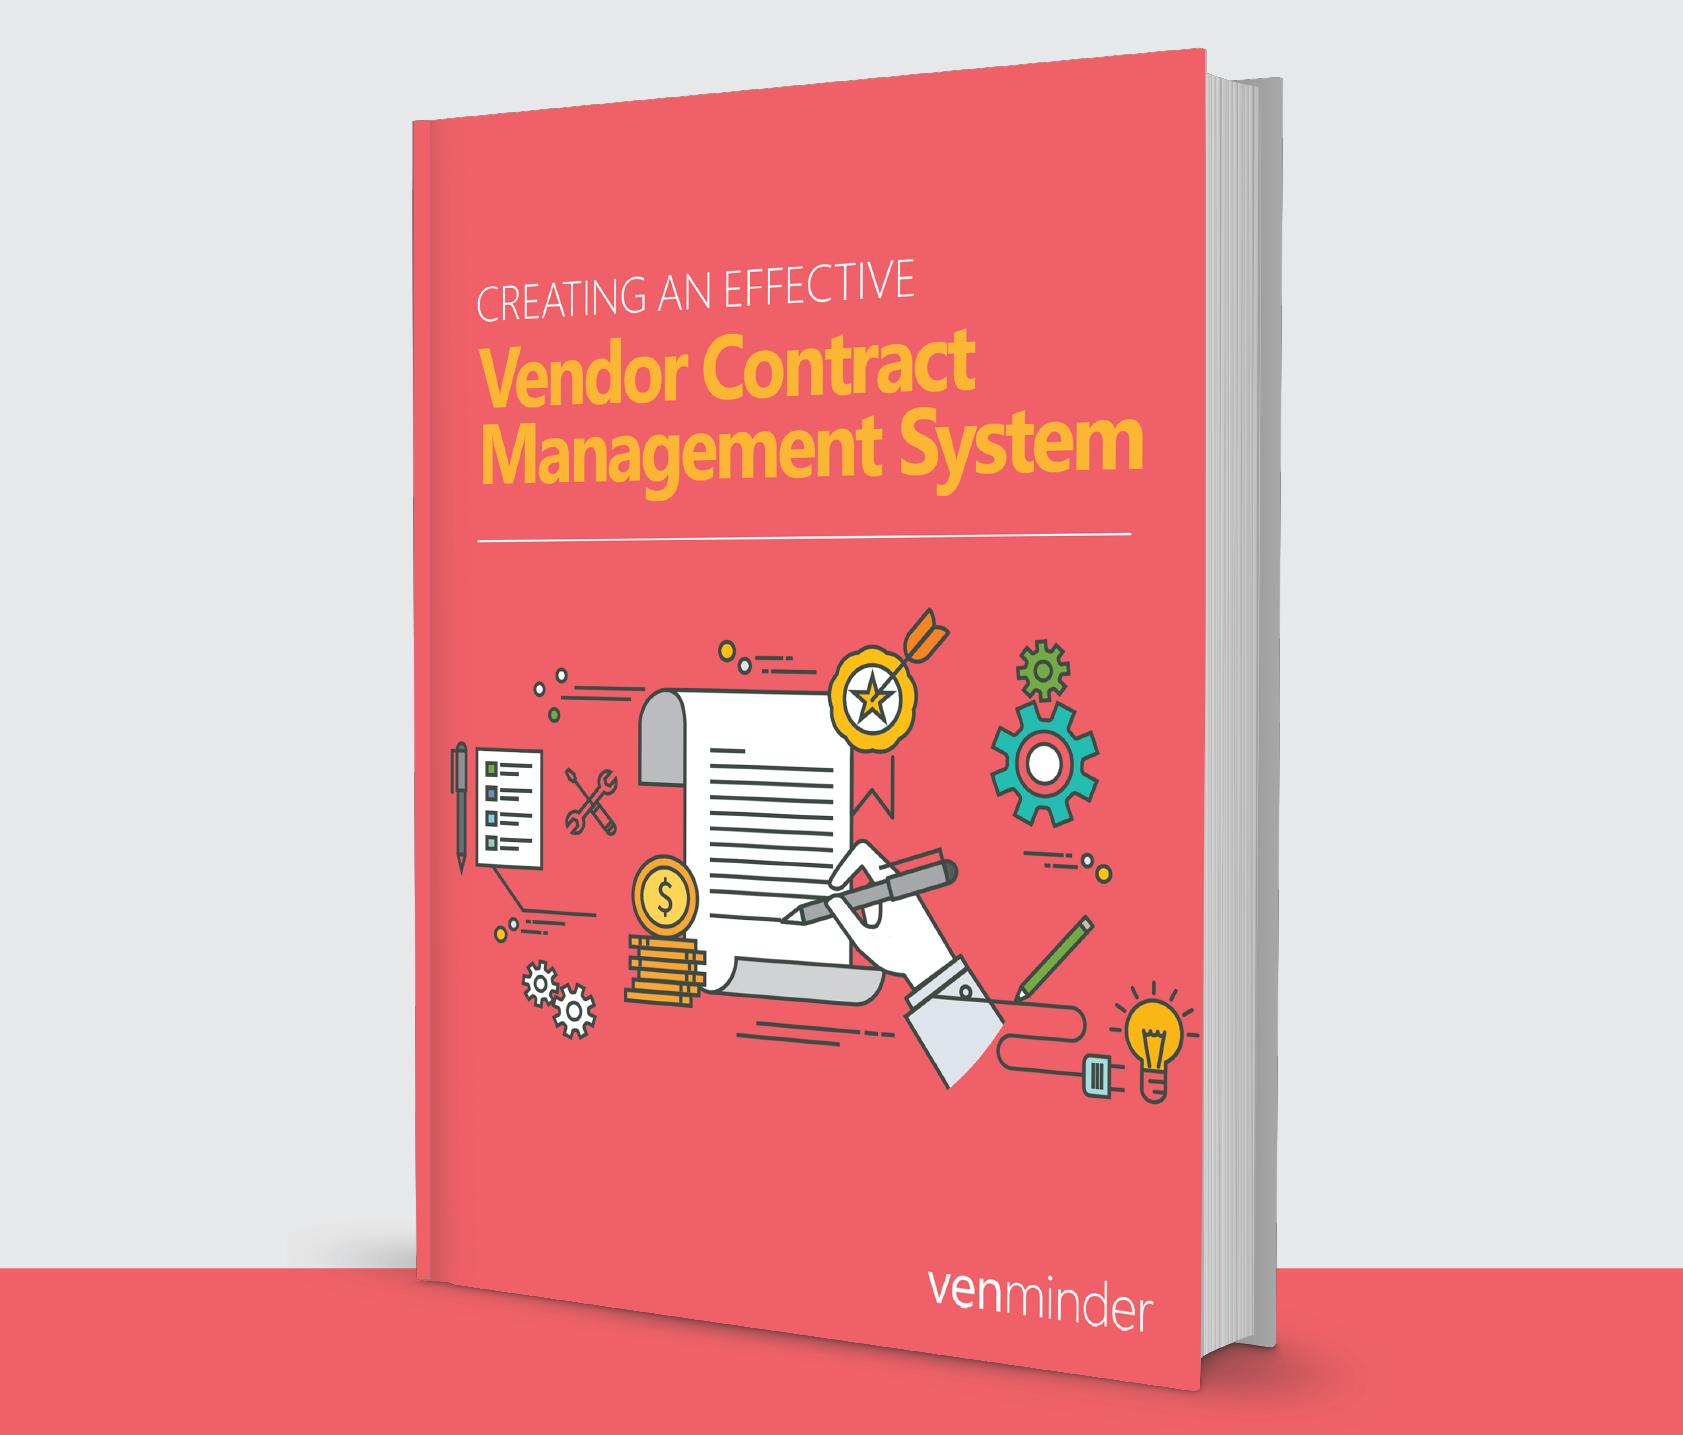 effective vendor contract management system